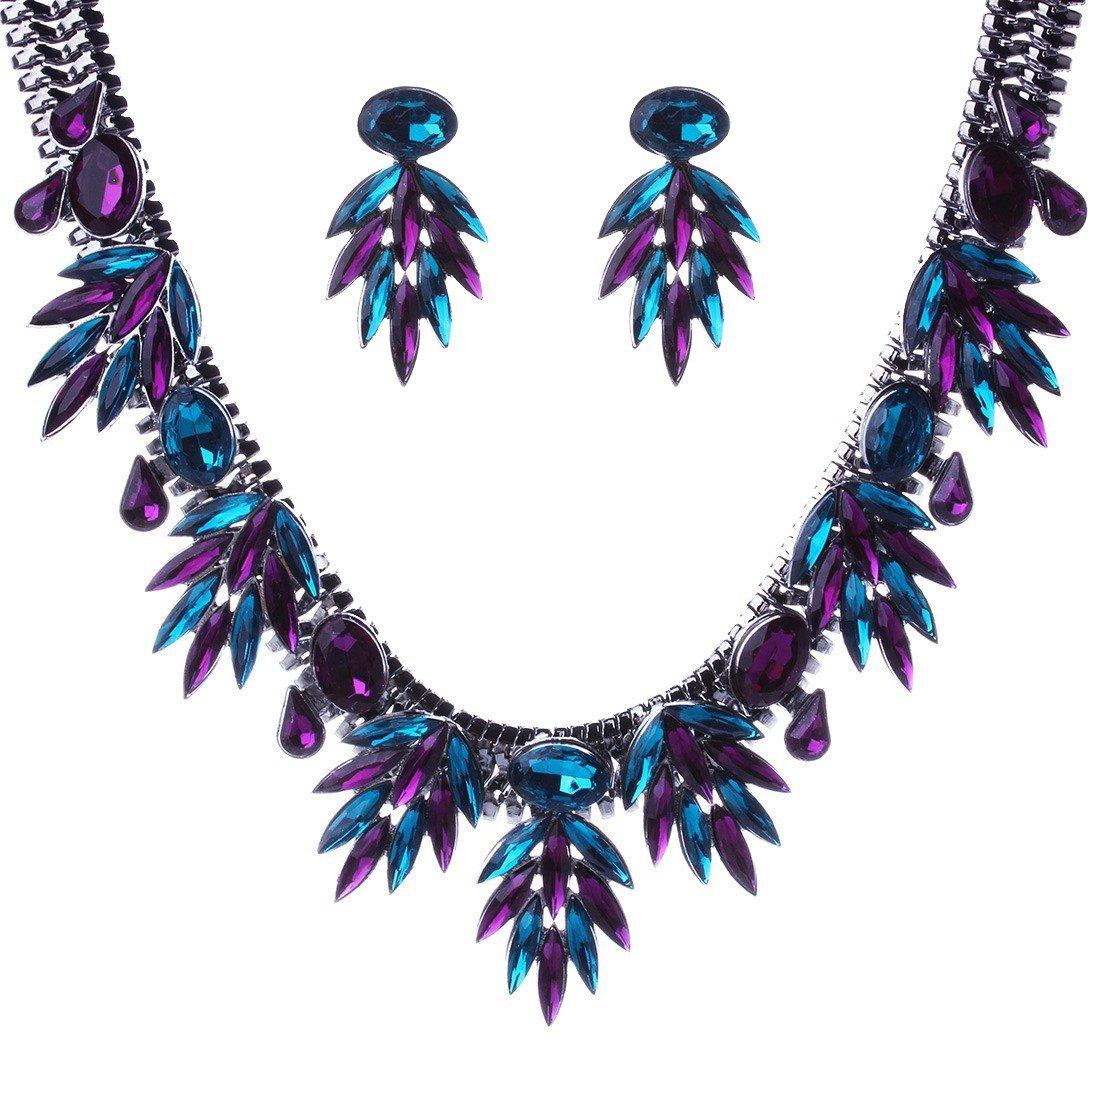 Qiyun Faceted Rhinestone Dangle Leaf Charm Fringe Bib Choker Collar Necklace Earrings Charme Feuille Facettes Frange Collier W005N2115